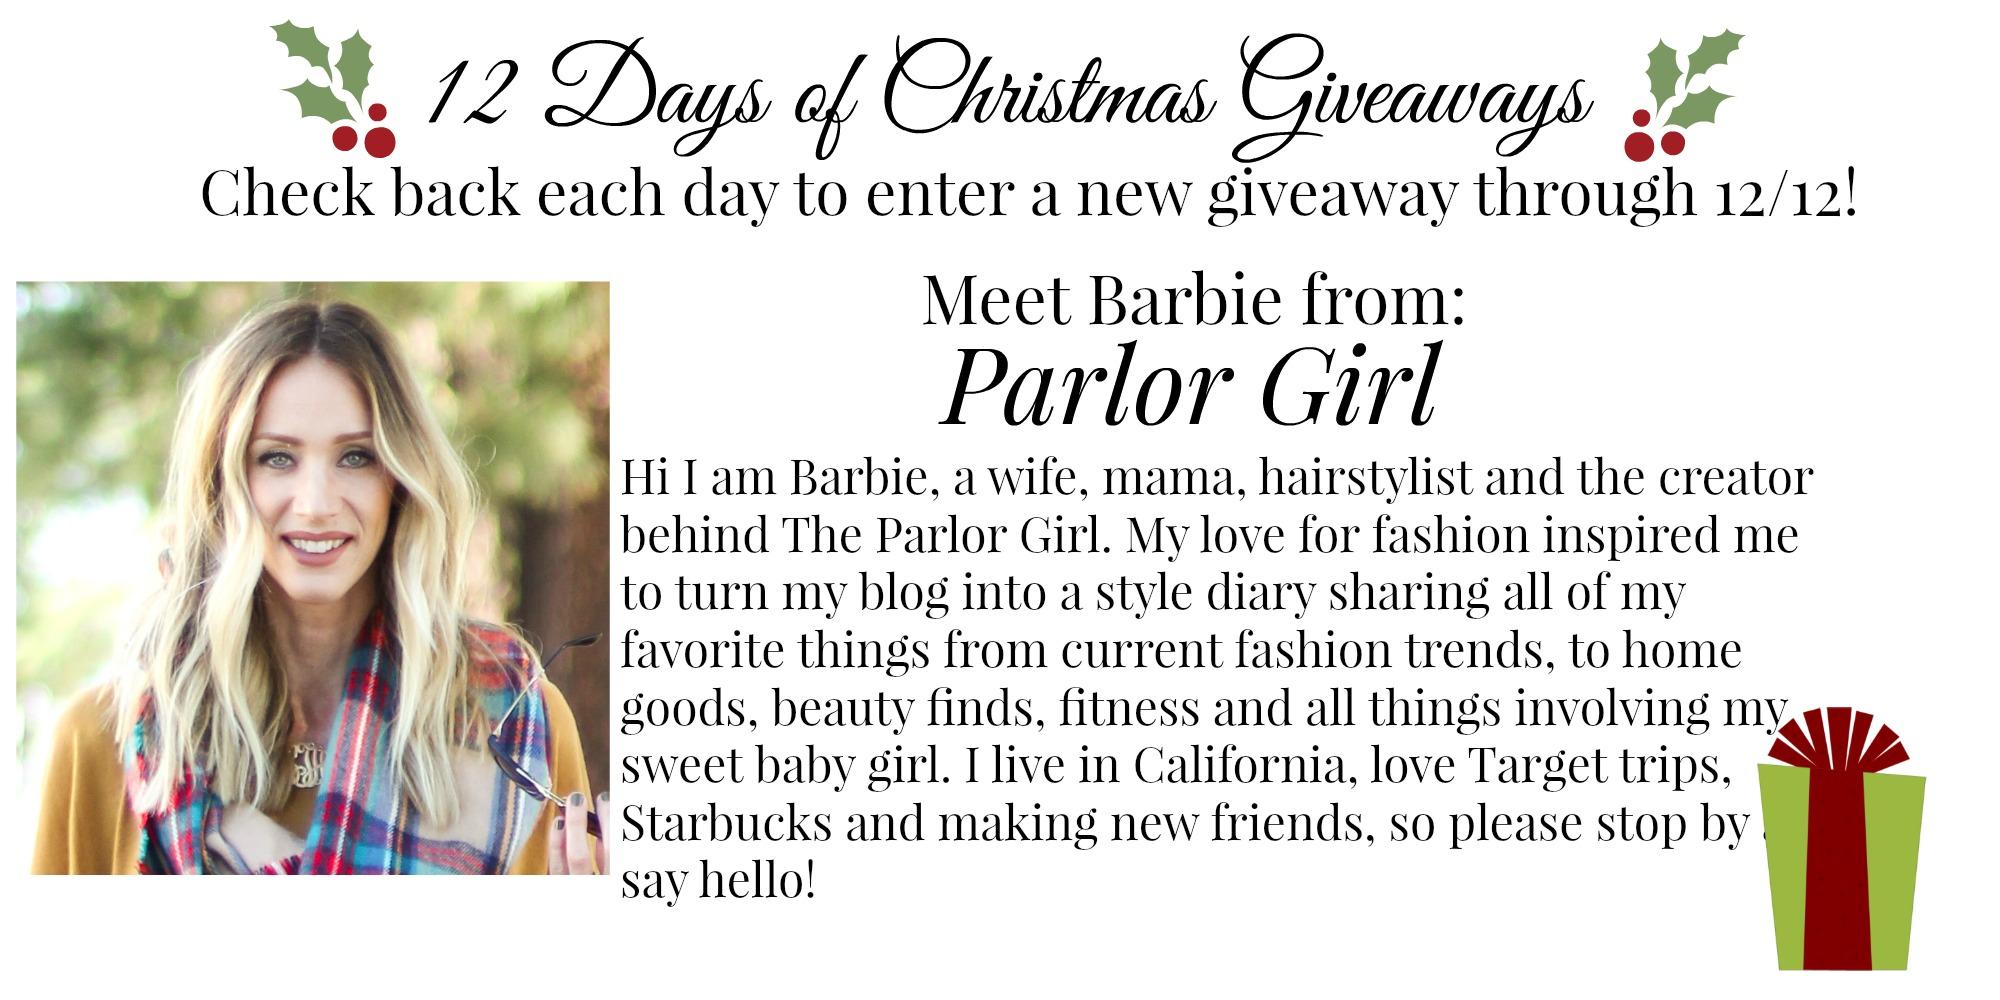 Barbie Parlor Girl